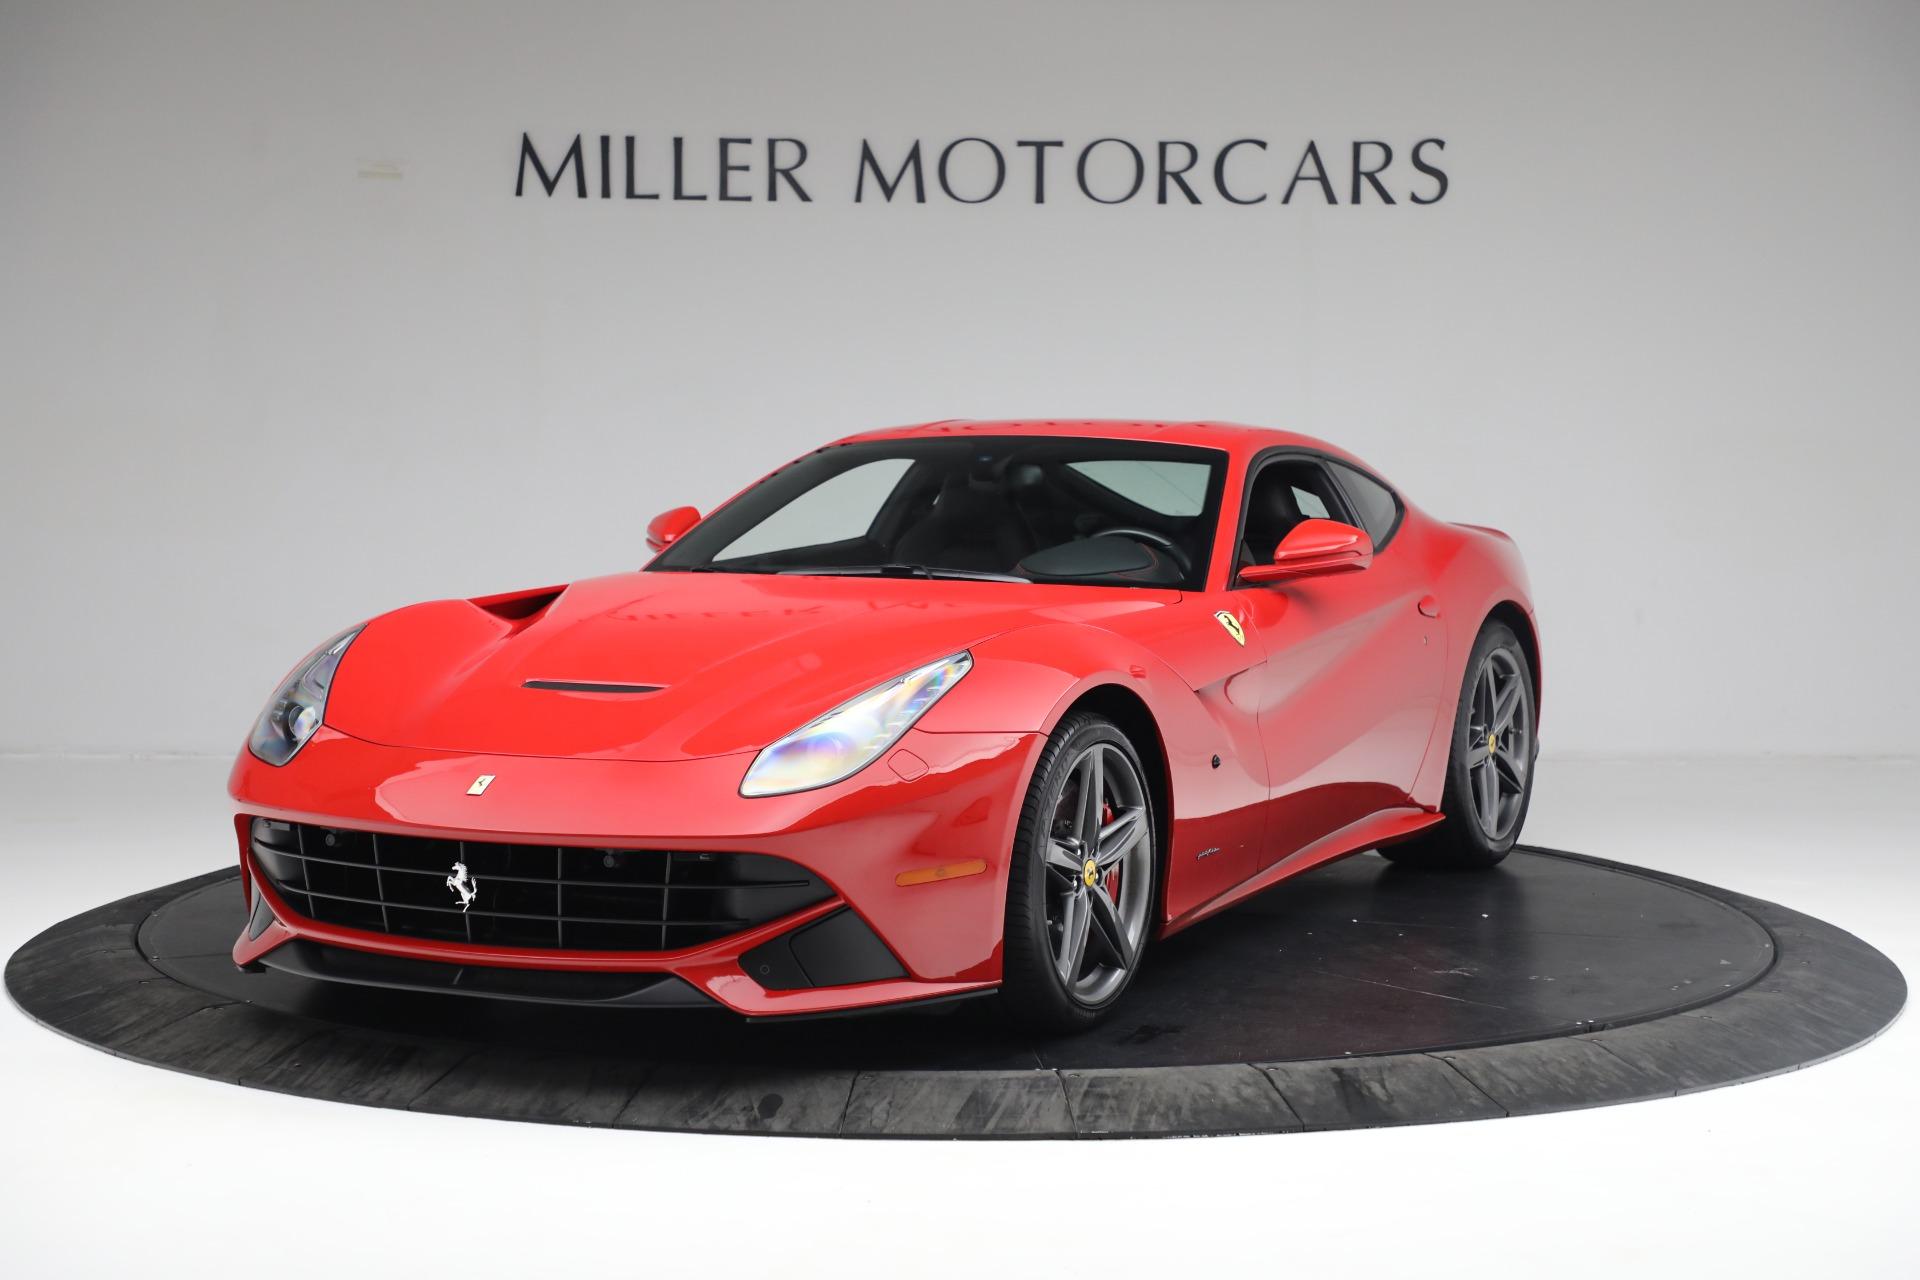 Used 2015 Ferrari F12 Berlinetta for sale Sold at Pagani of Greenwich in Greenwich CT 06830 1